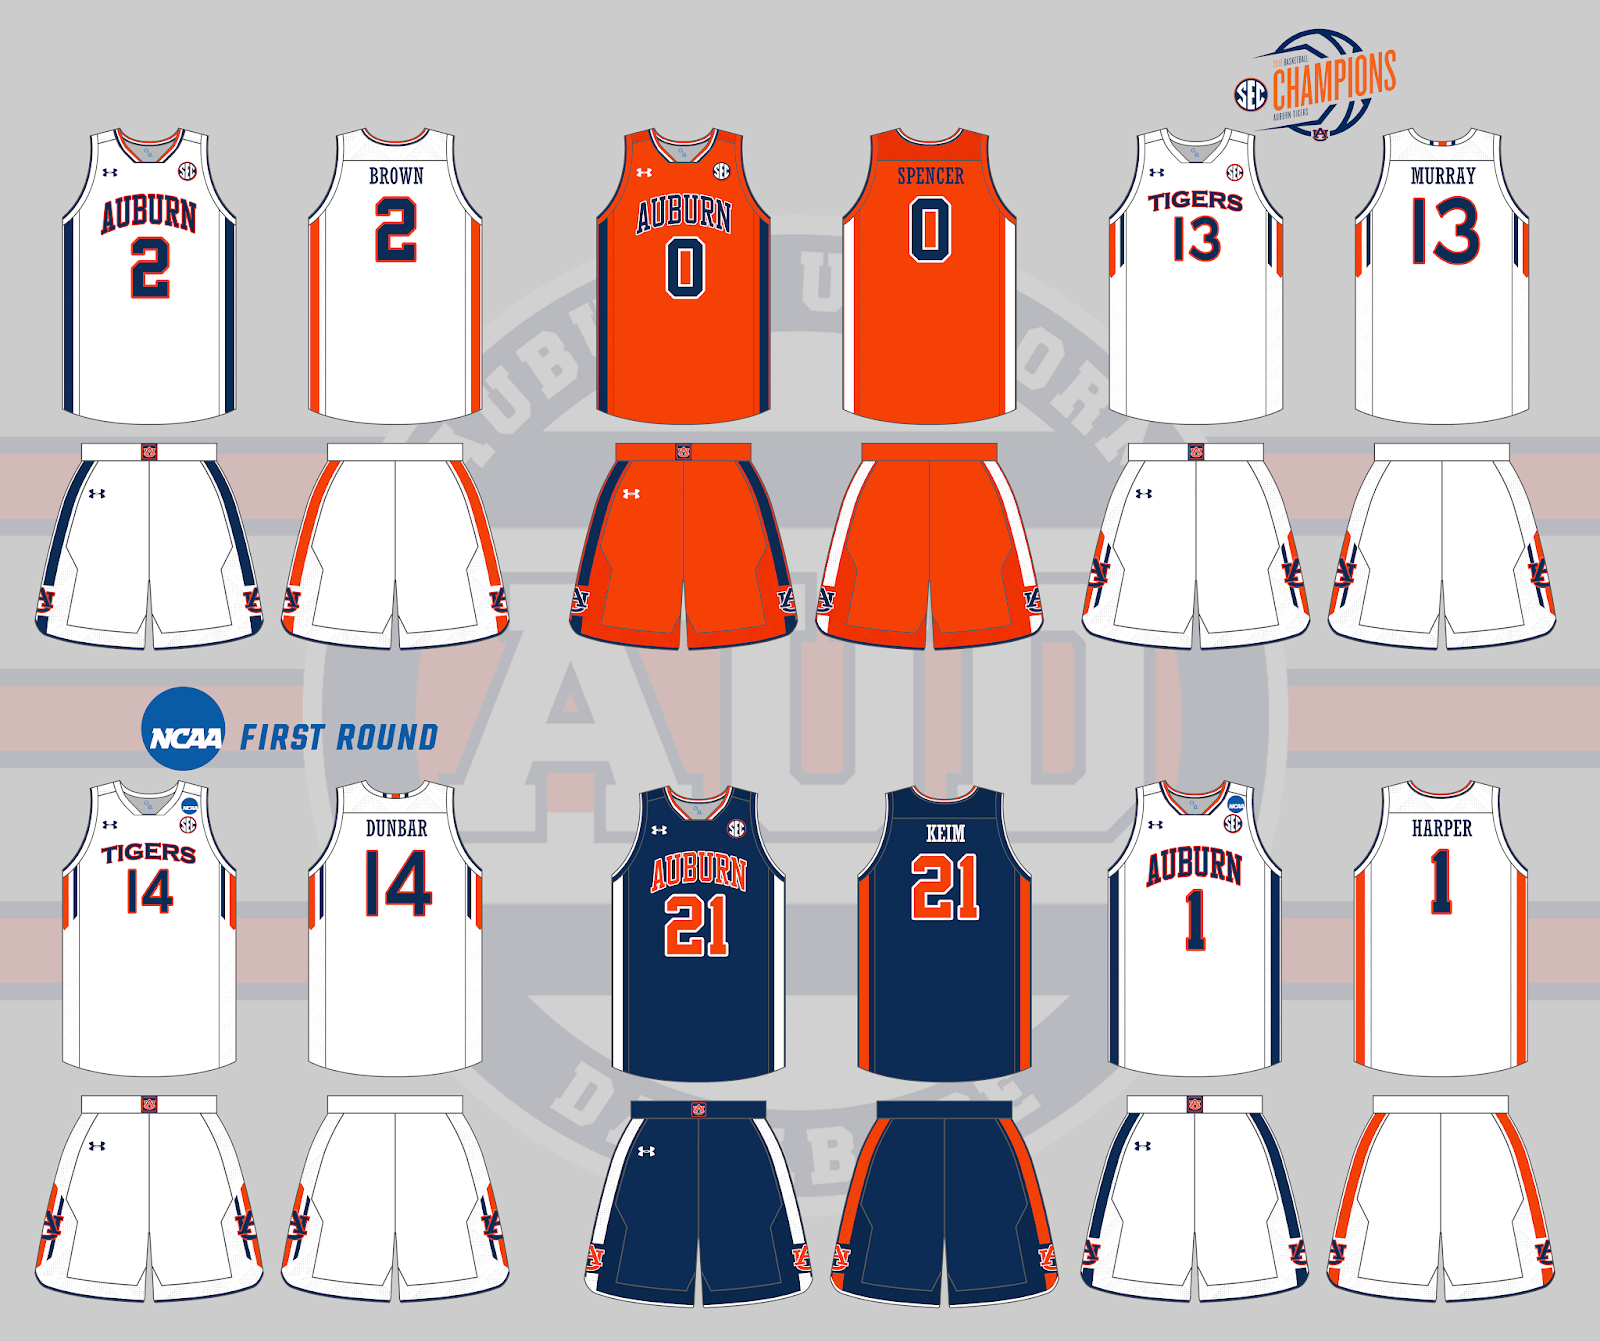 b57d7d5df8b Auburn Uniform Database  Basketball Uniforms